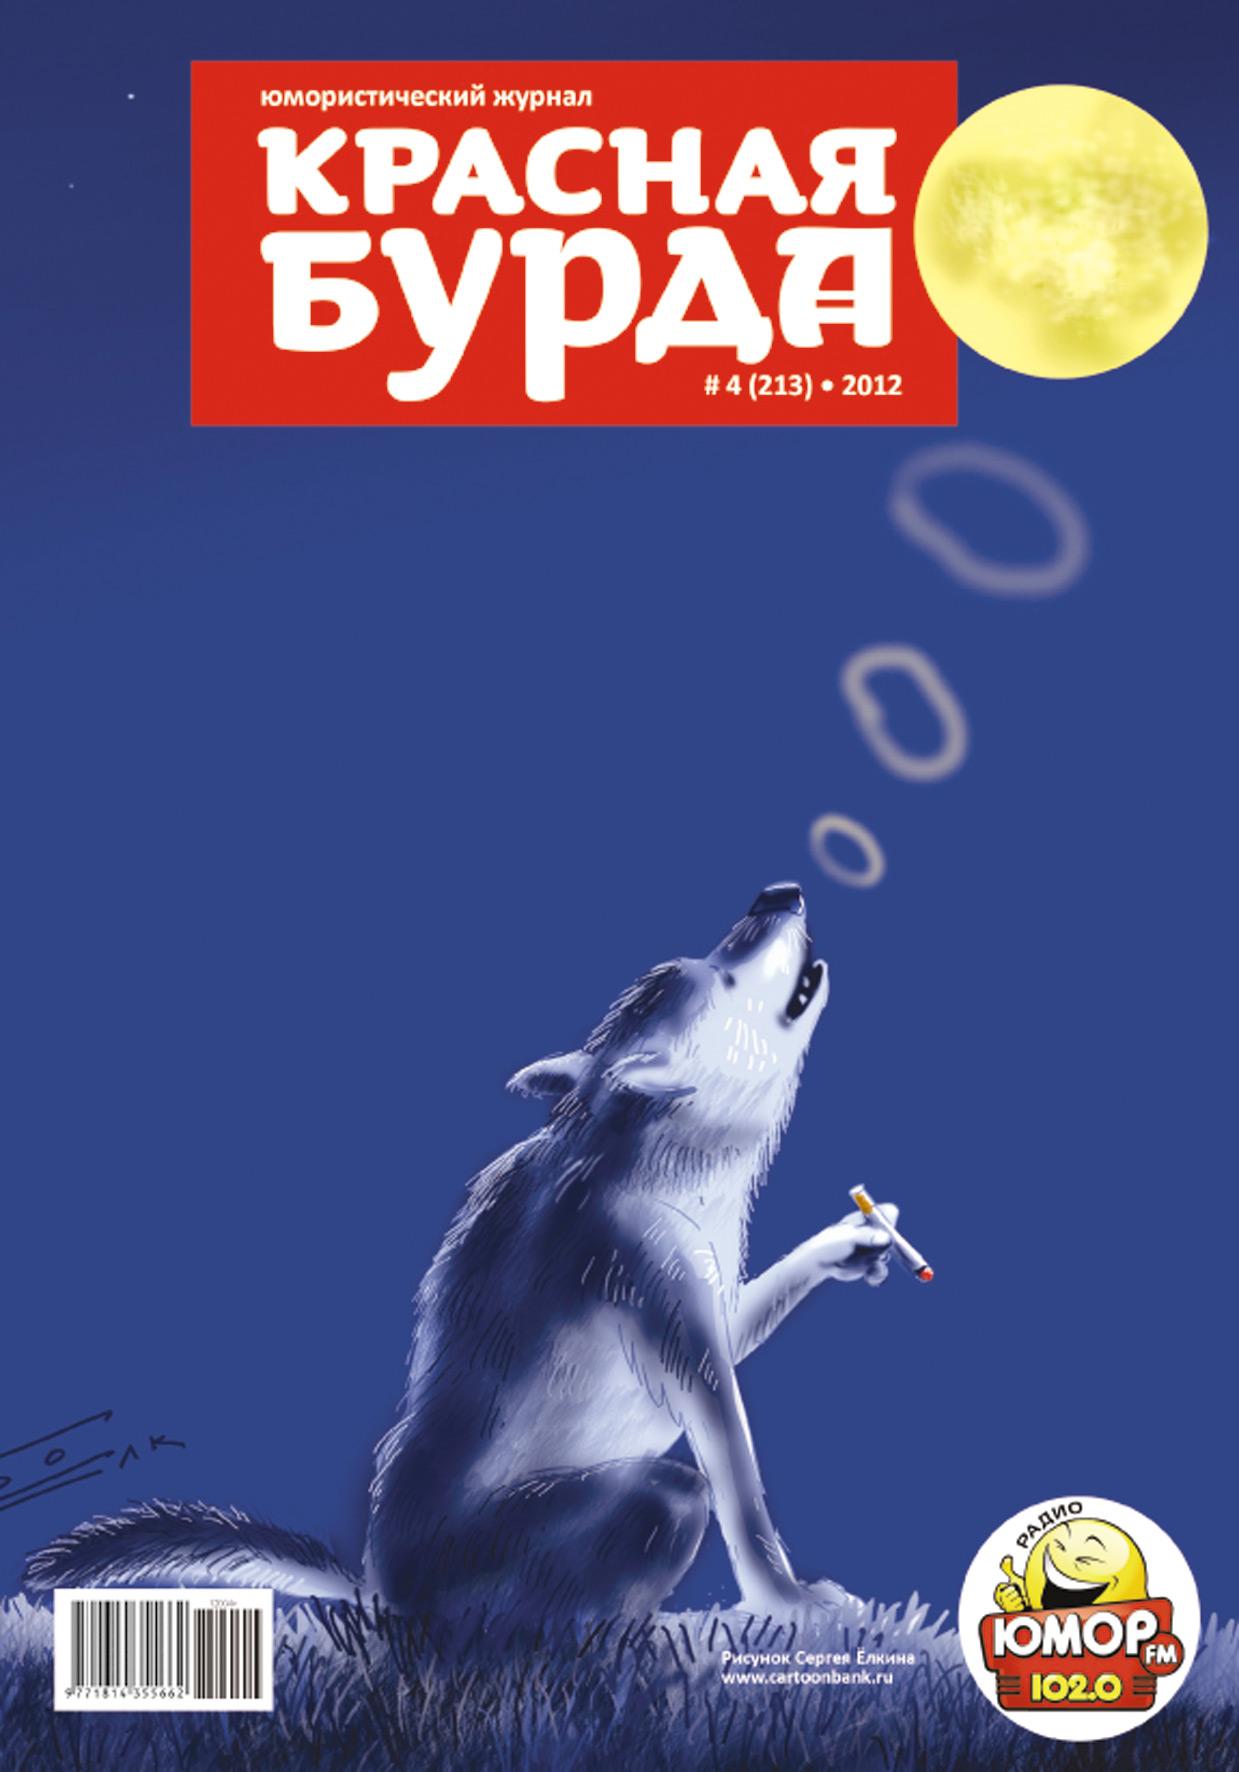 Красная бурда. Юмористический журнал №4 (213) 2012